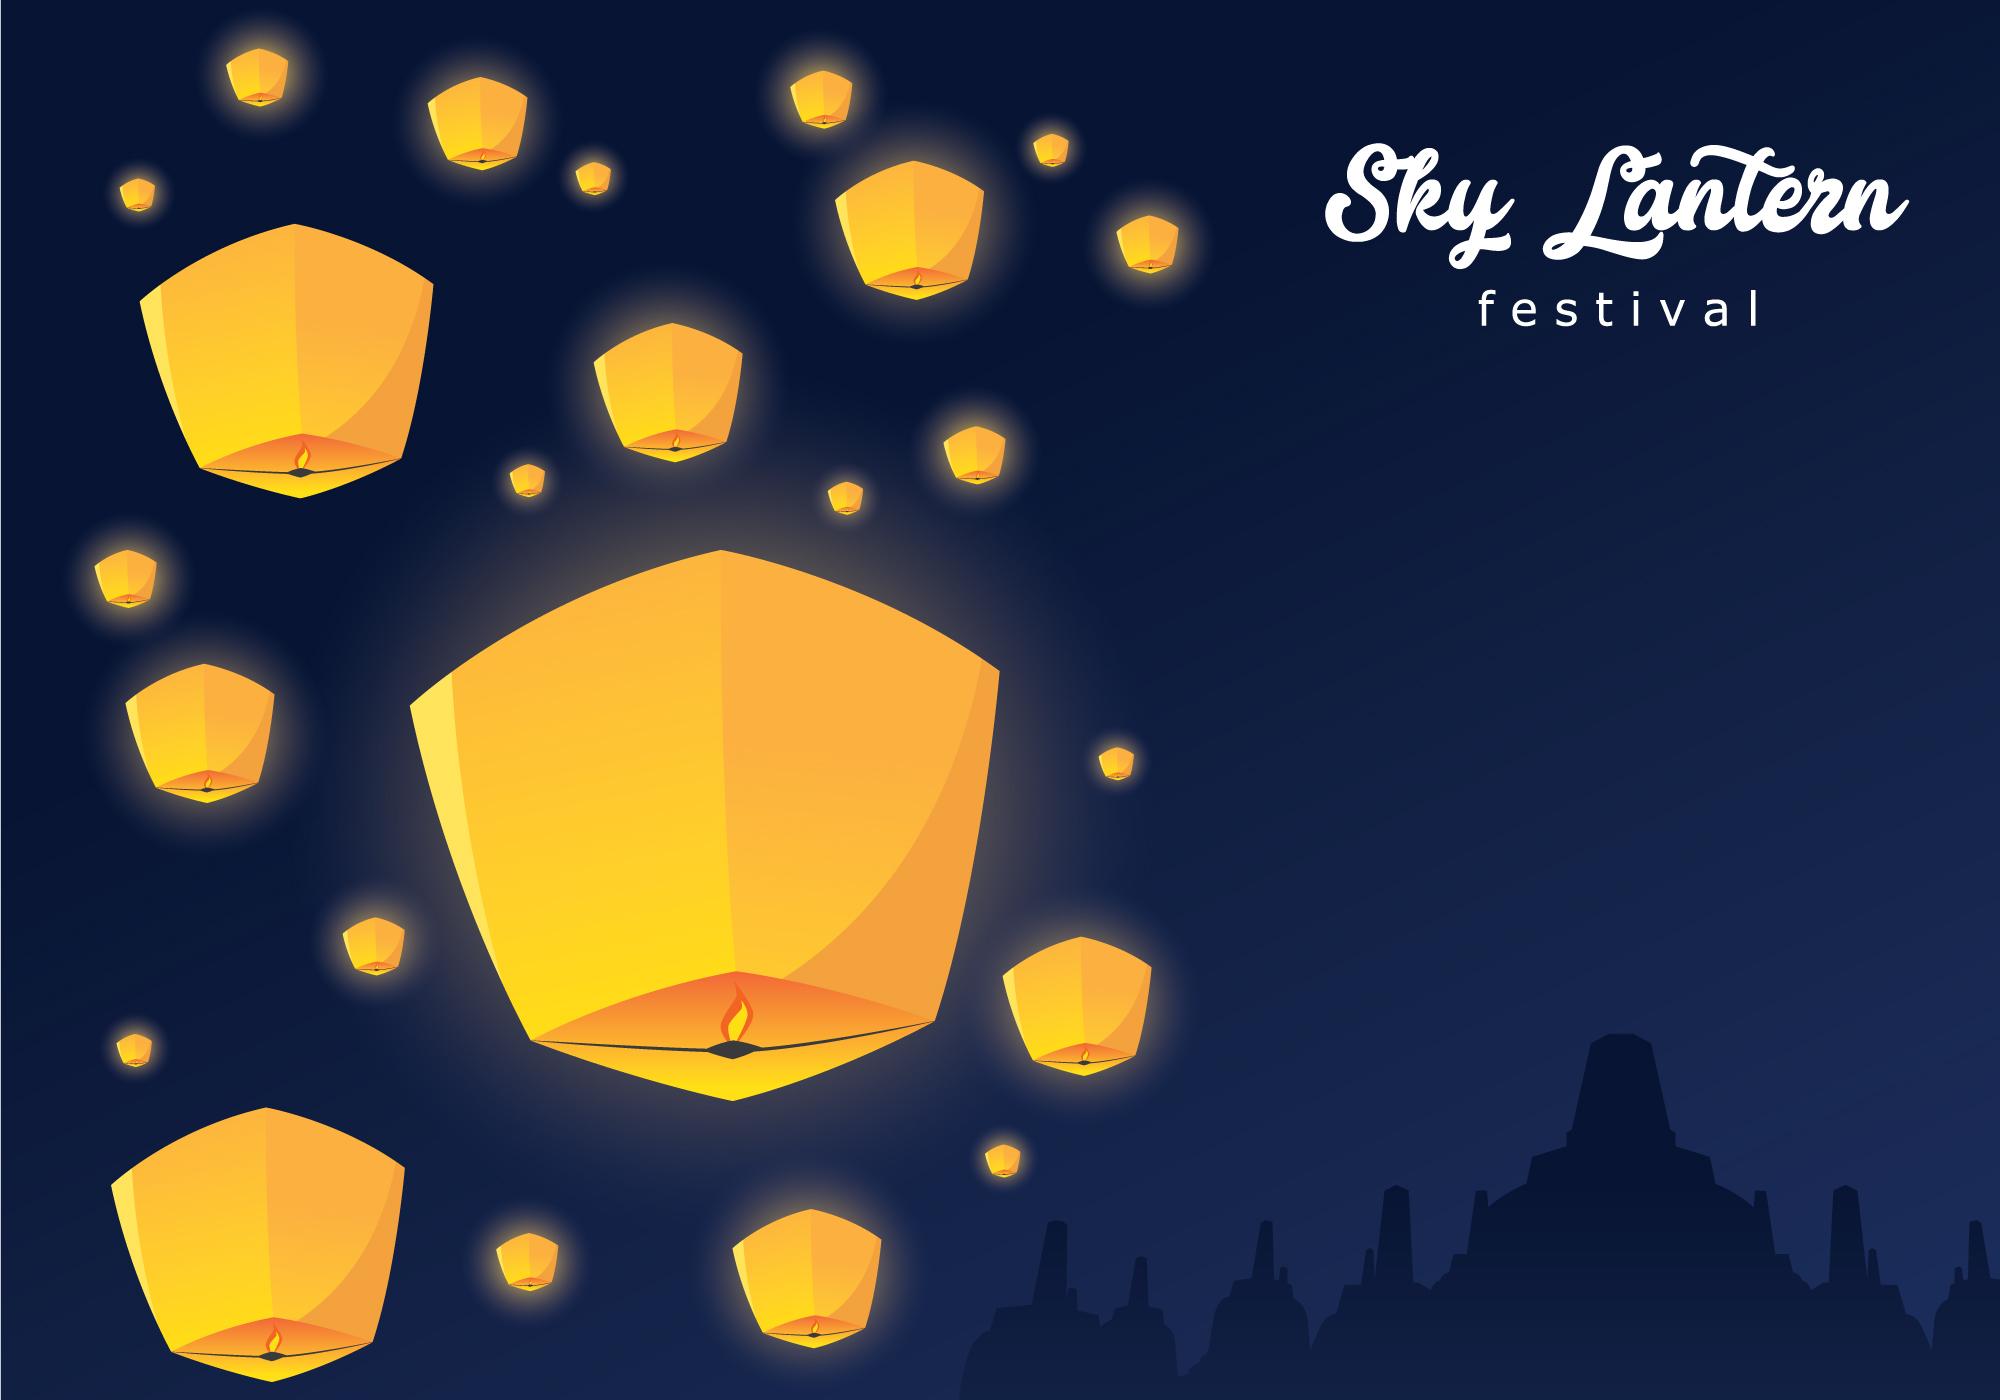 Sky Lantern Festival Background Download Free Vectors Clipart Graphics Vector Art